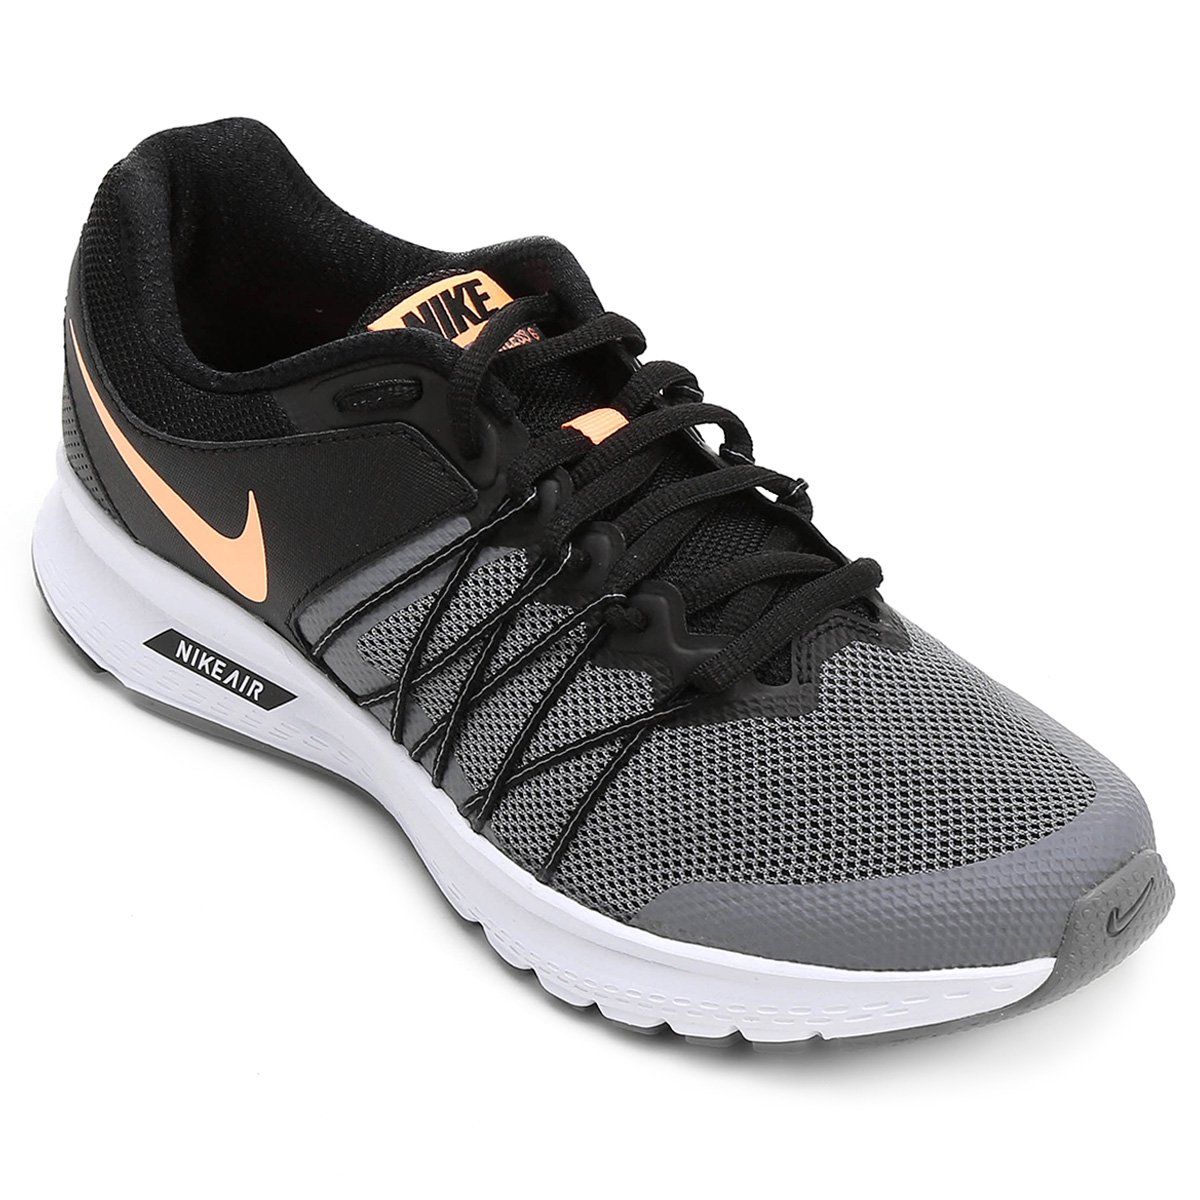 59a450b3fde Tênis Nike Air Relentless 6 MSL Feminino - Preto e Cinza - Compre Agora